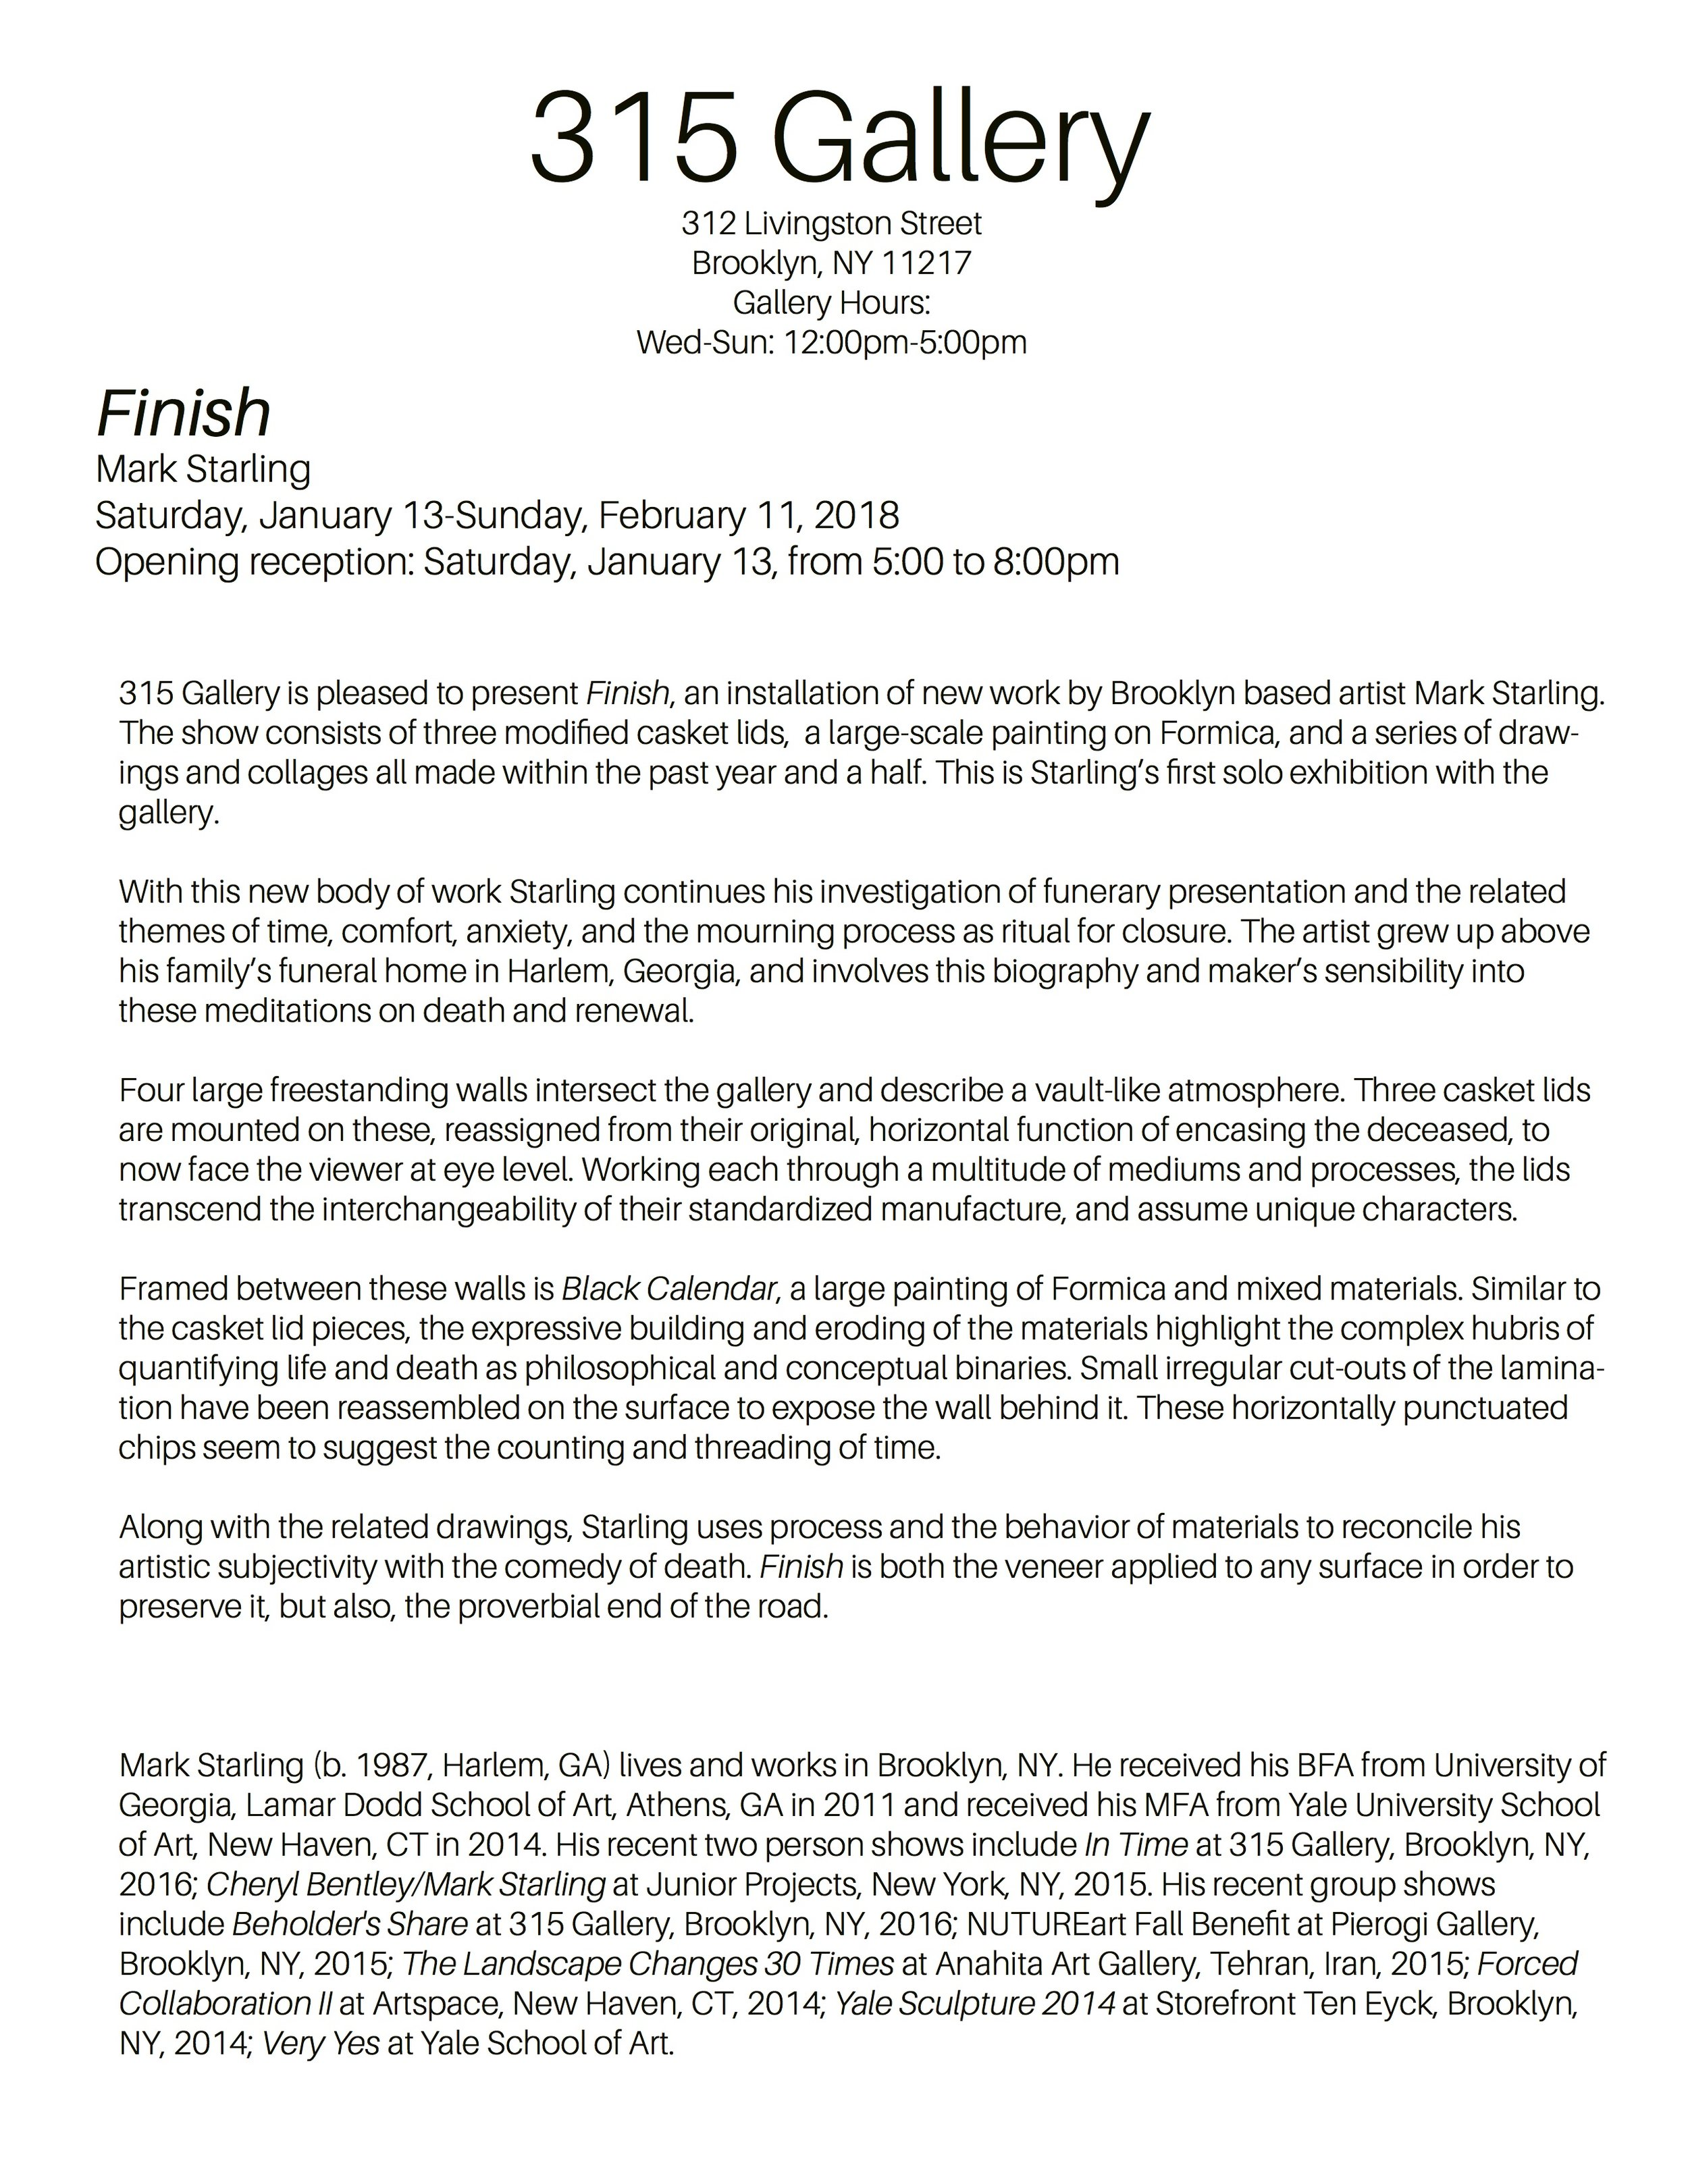 Finish Press Release.jpg